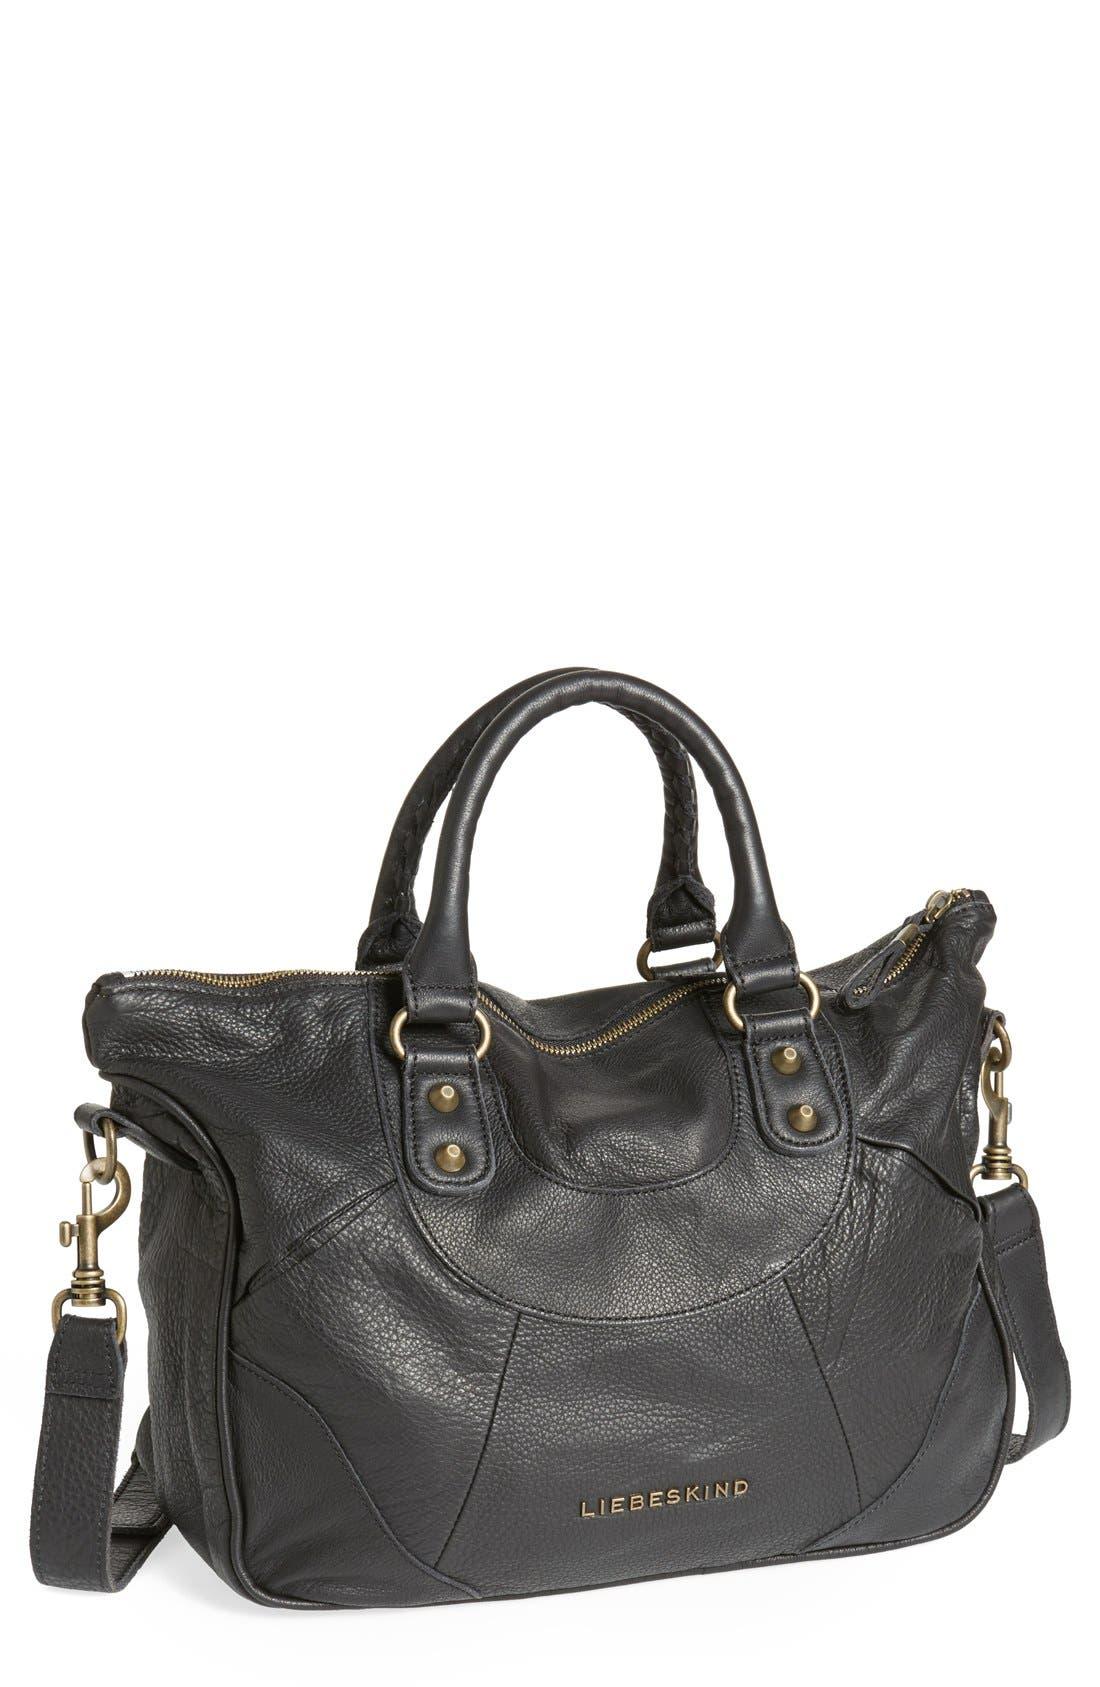 Main Image - Liebeskind 'Vintage Esther' Soft Leather Tote